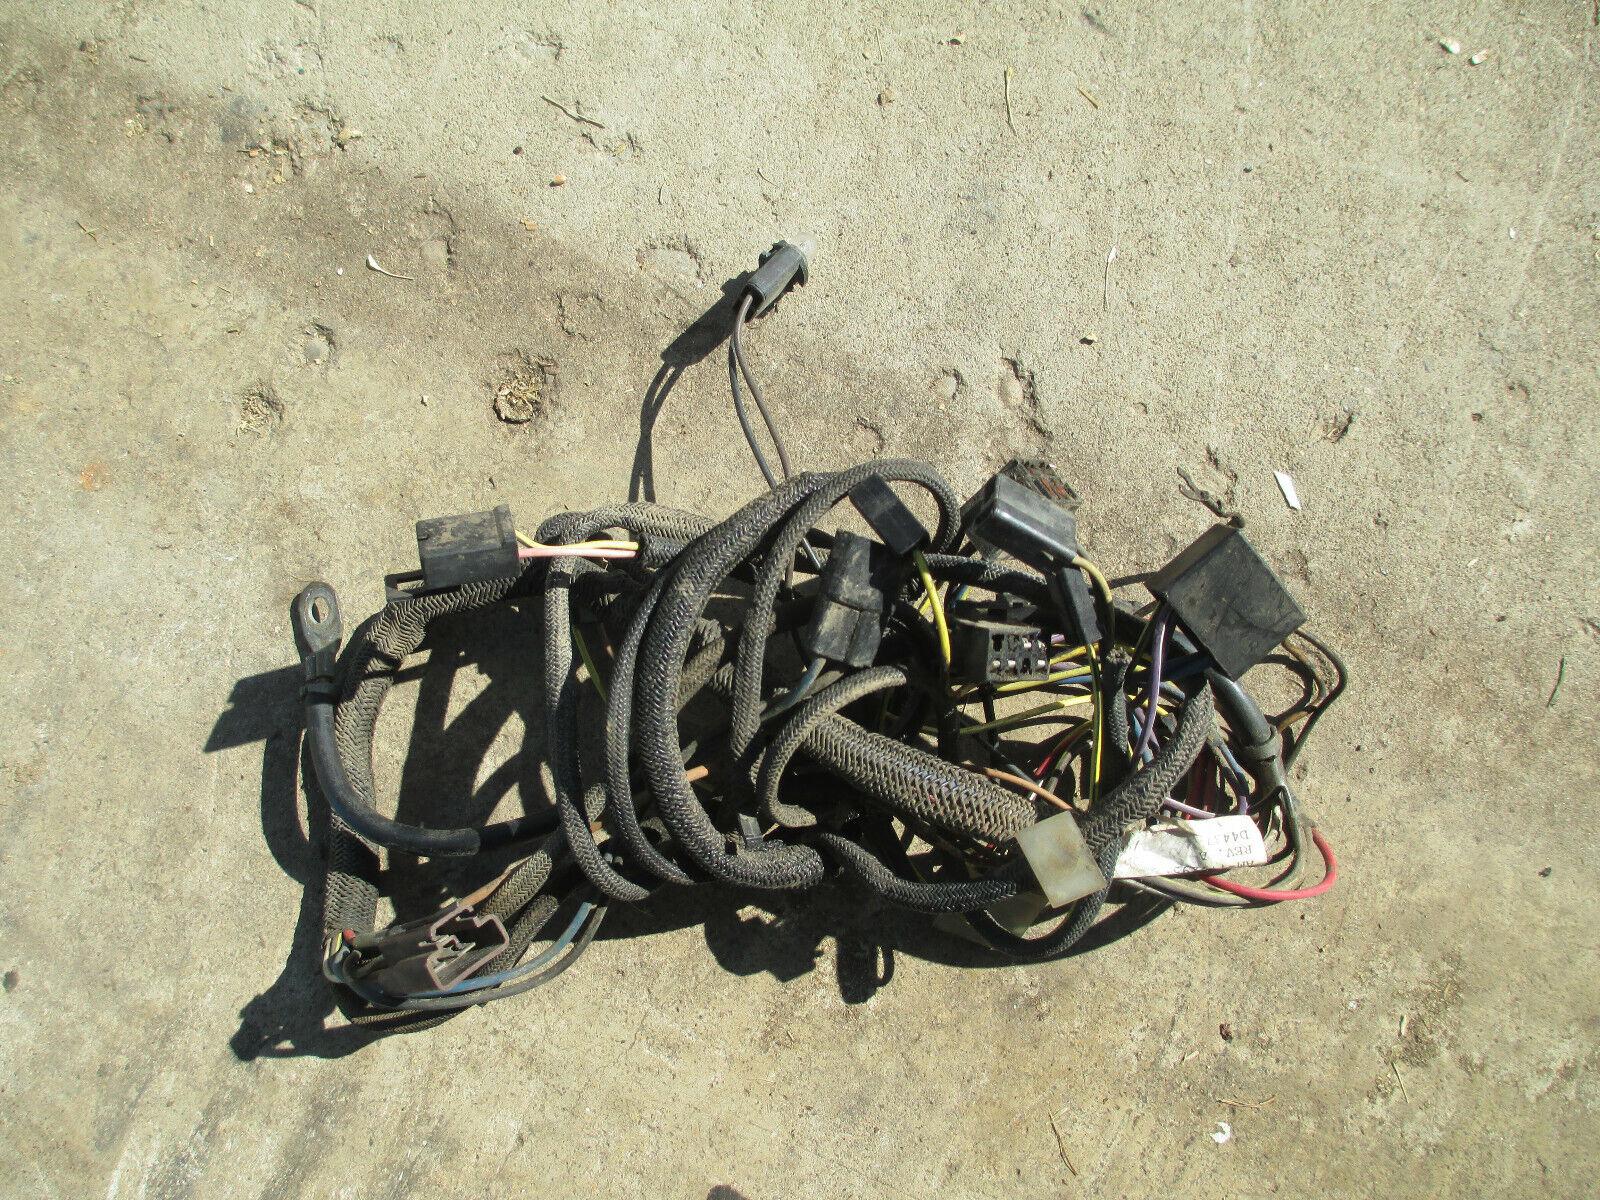 John Deere 160 Lawn Tractor Main Wiring Harness AM104916 for sale online    eBayeBay